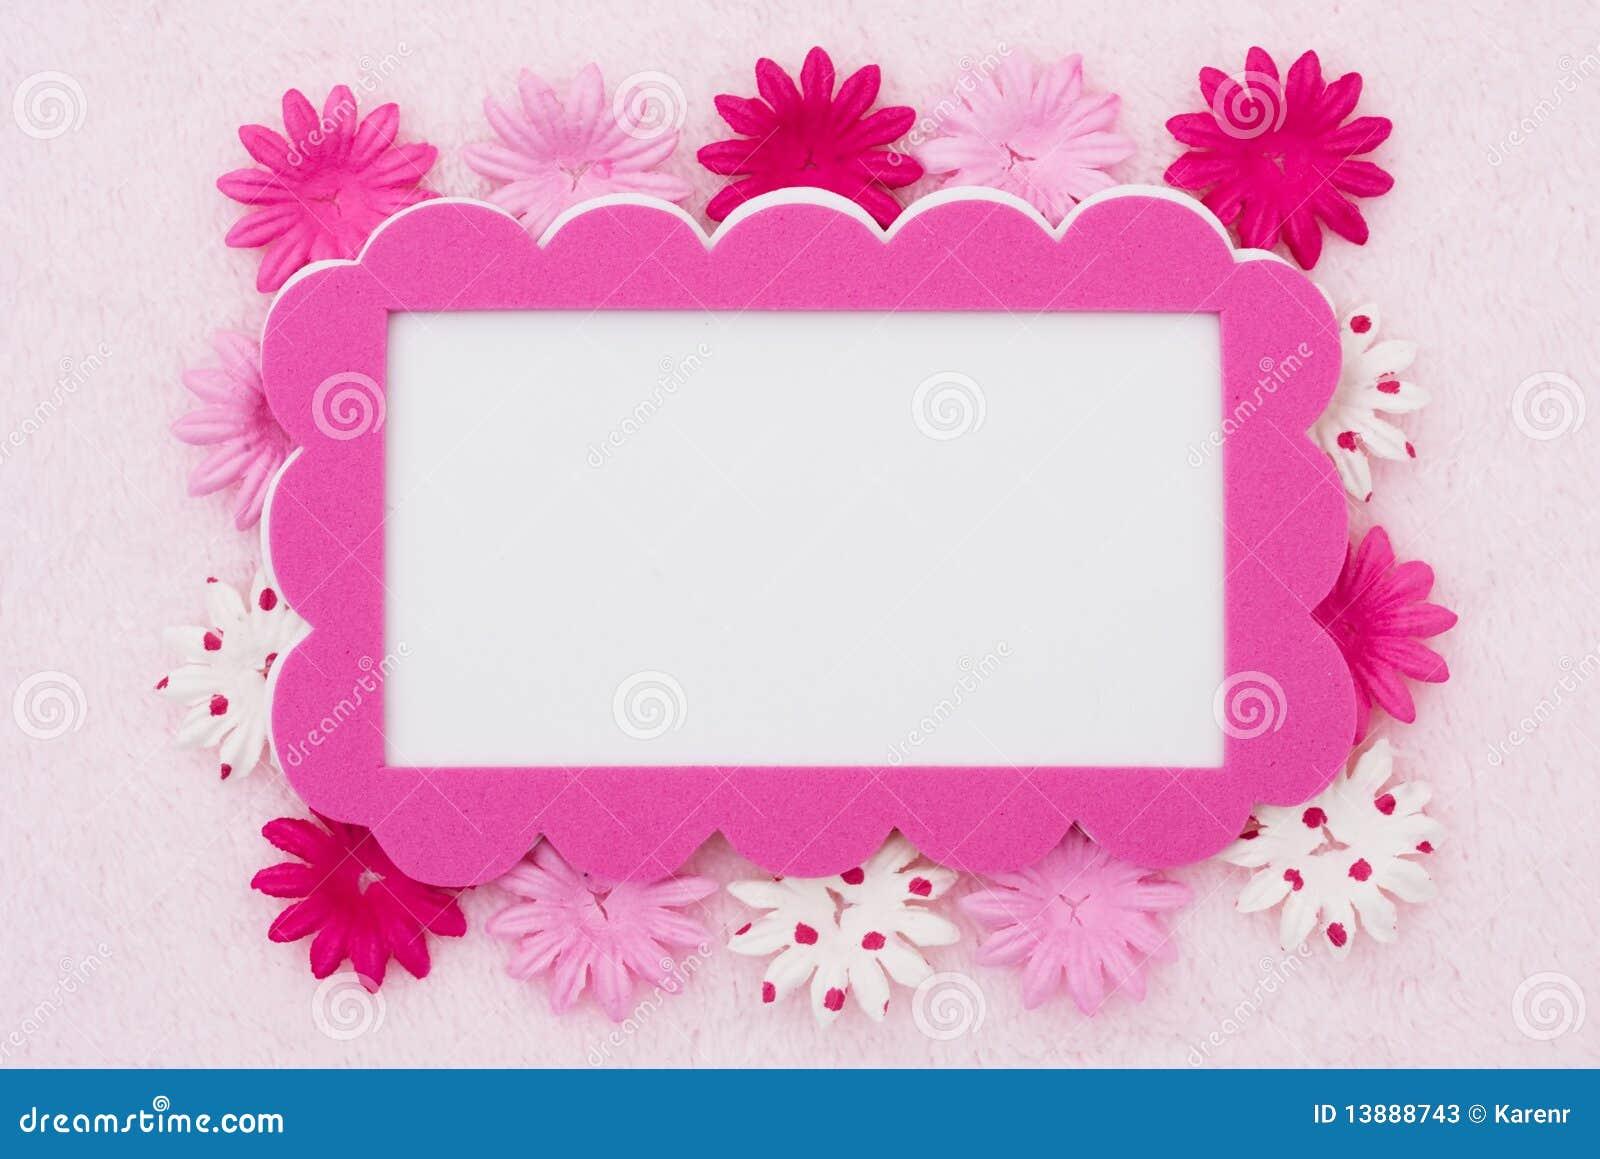 Pink Flower Border Images Comousar